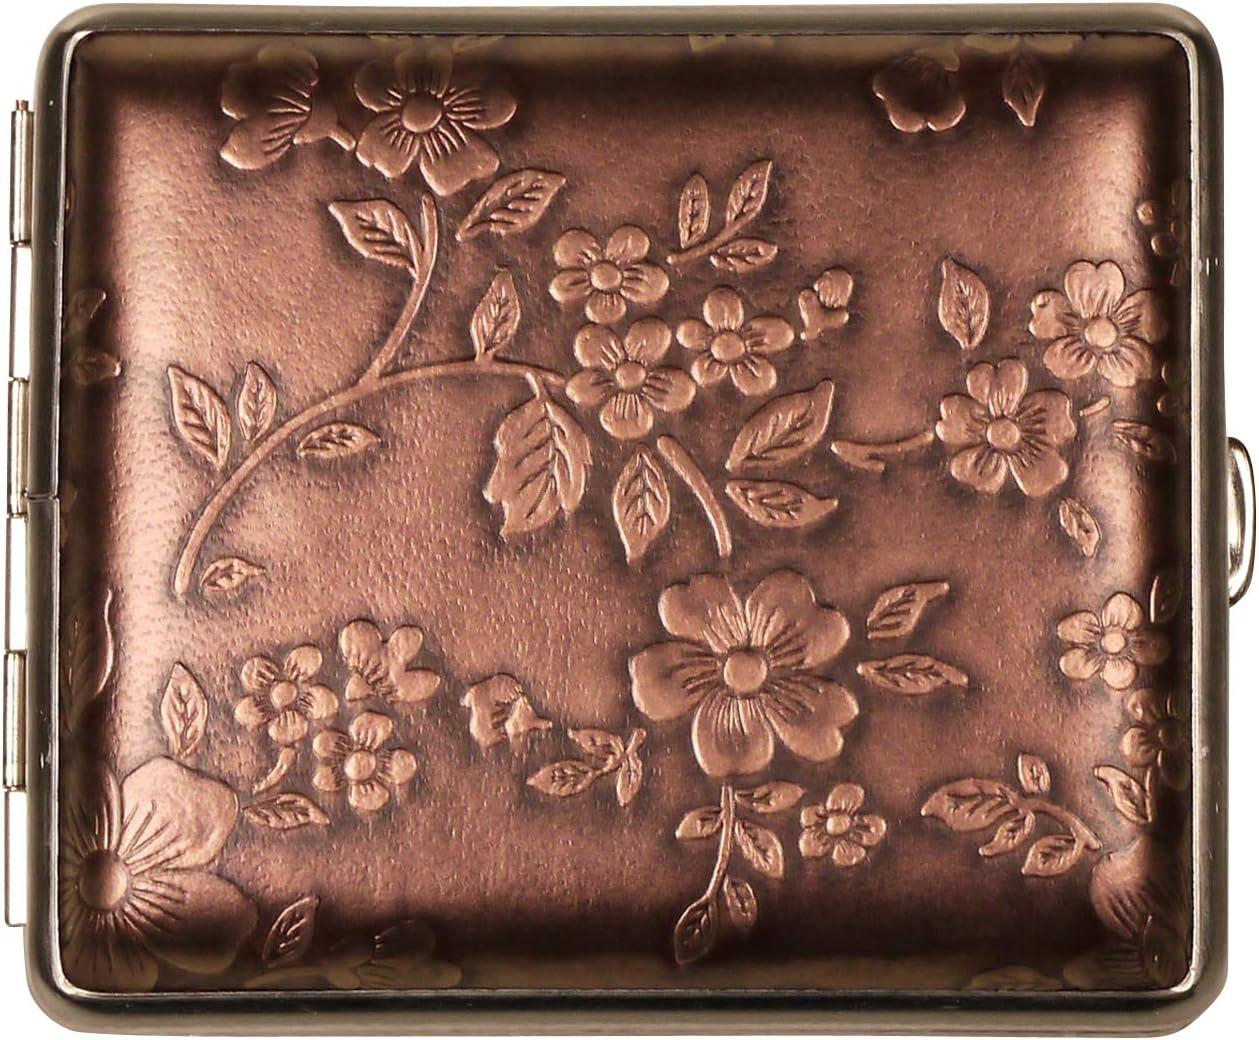 Made in Germany Zigarettenetui Blumen Bronze Rahmen Nickel matt 18er mit Gummiband